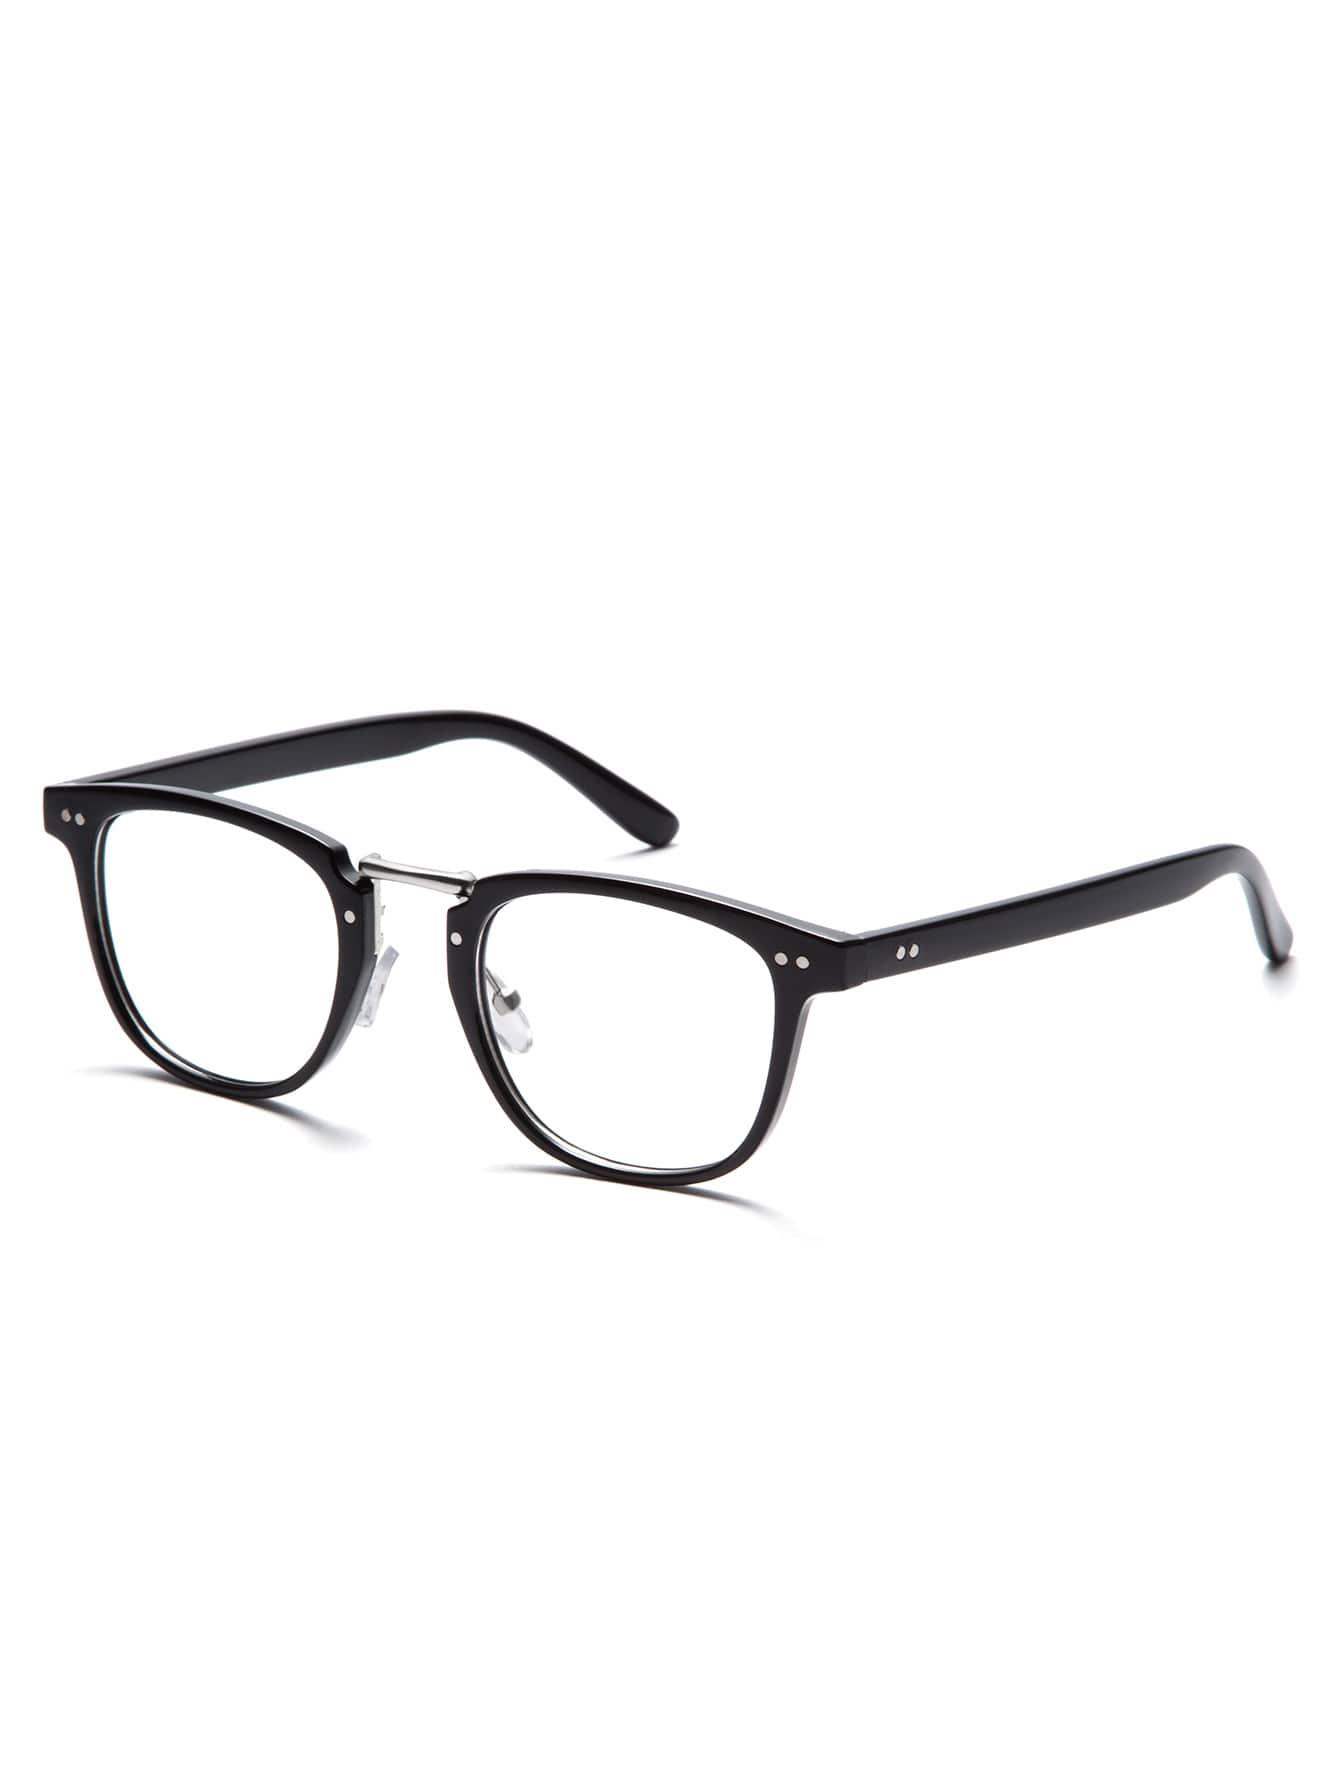 Black Frame Clear Lens Glasses sunglass160909309